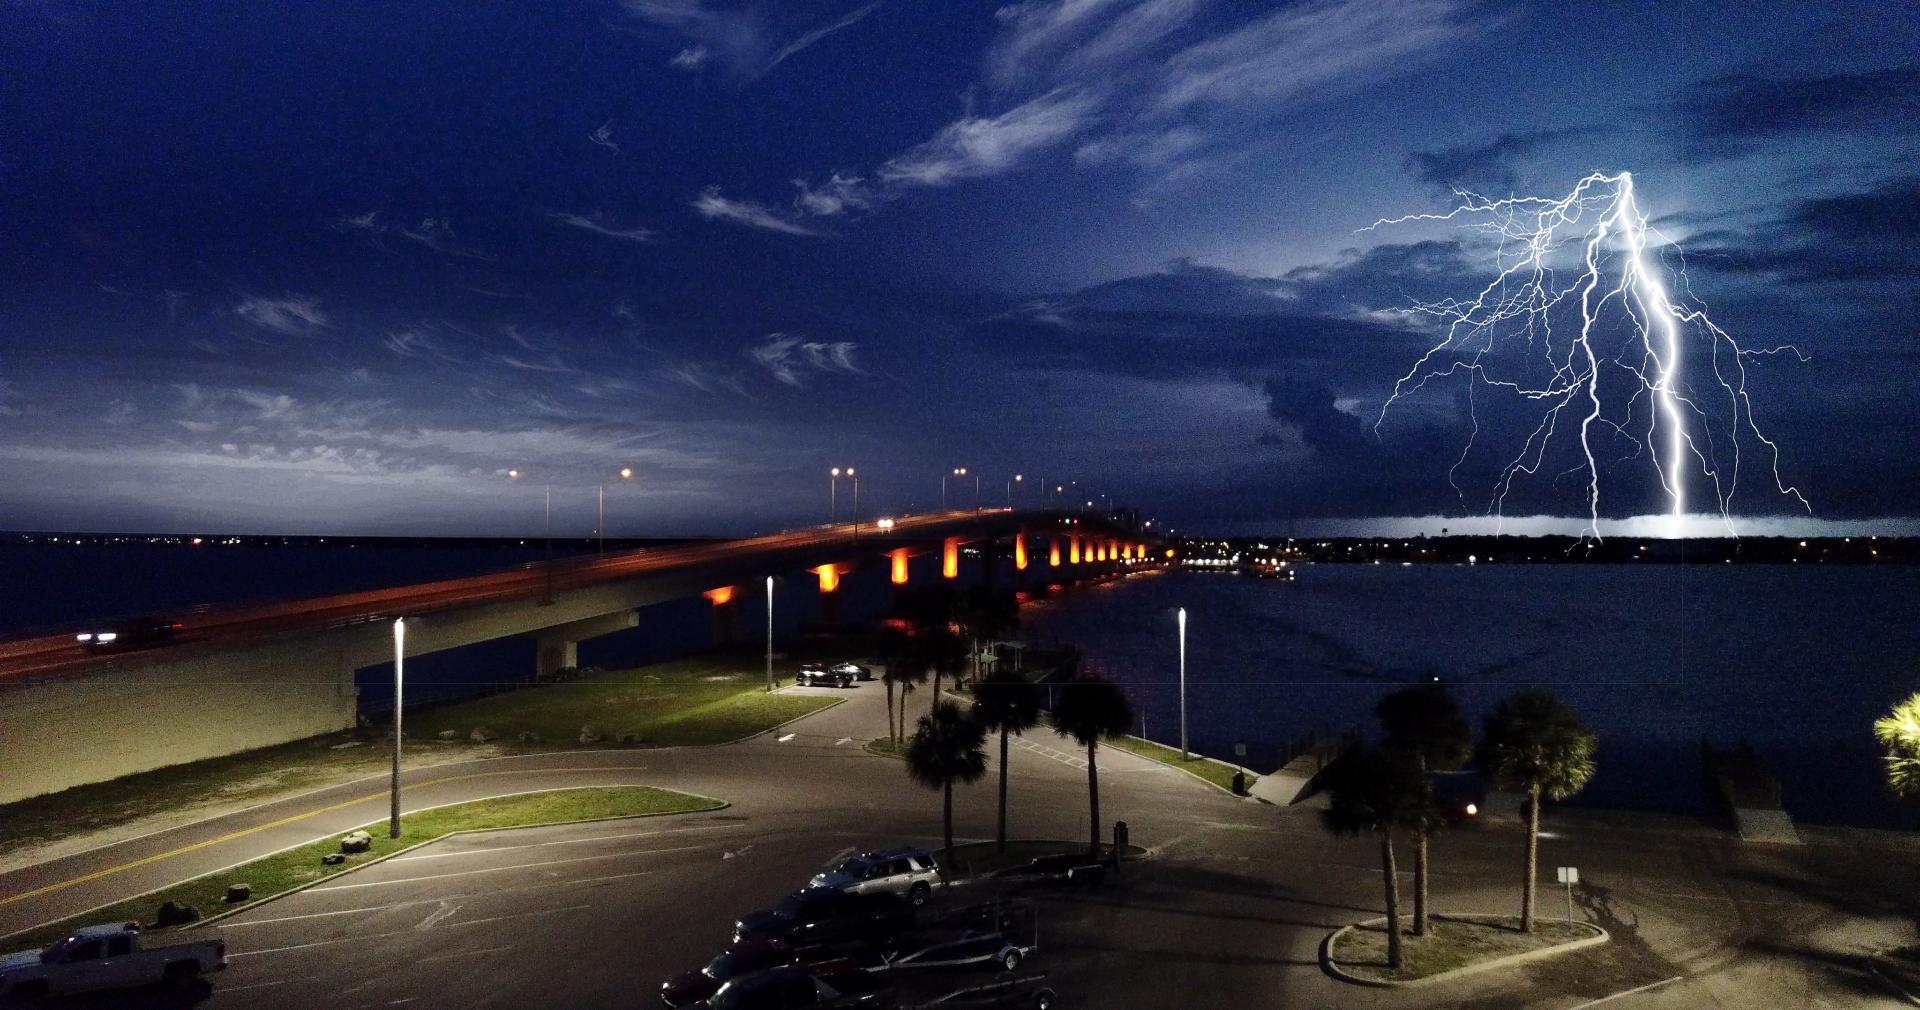 Titusville Lightning